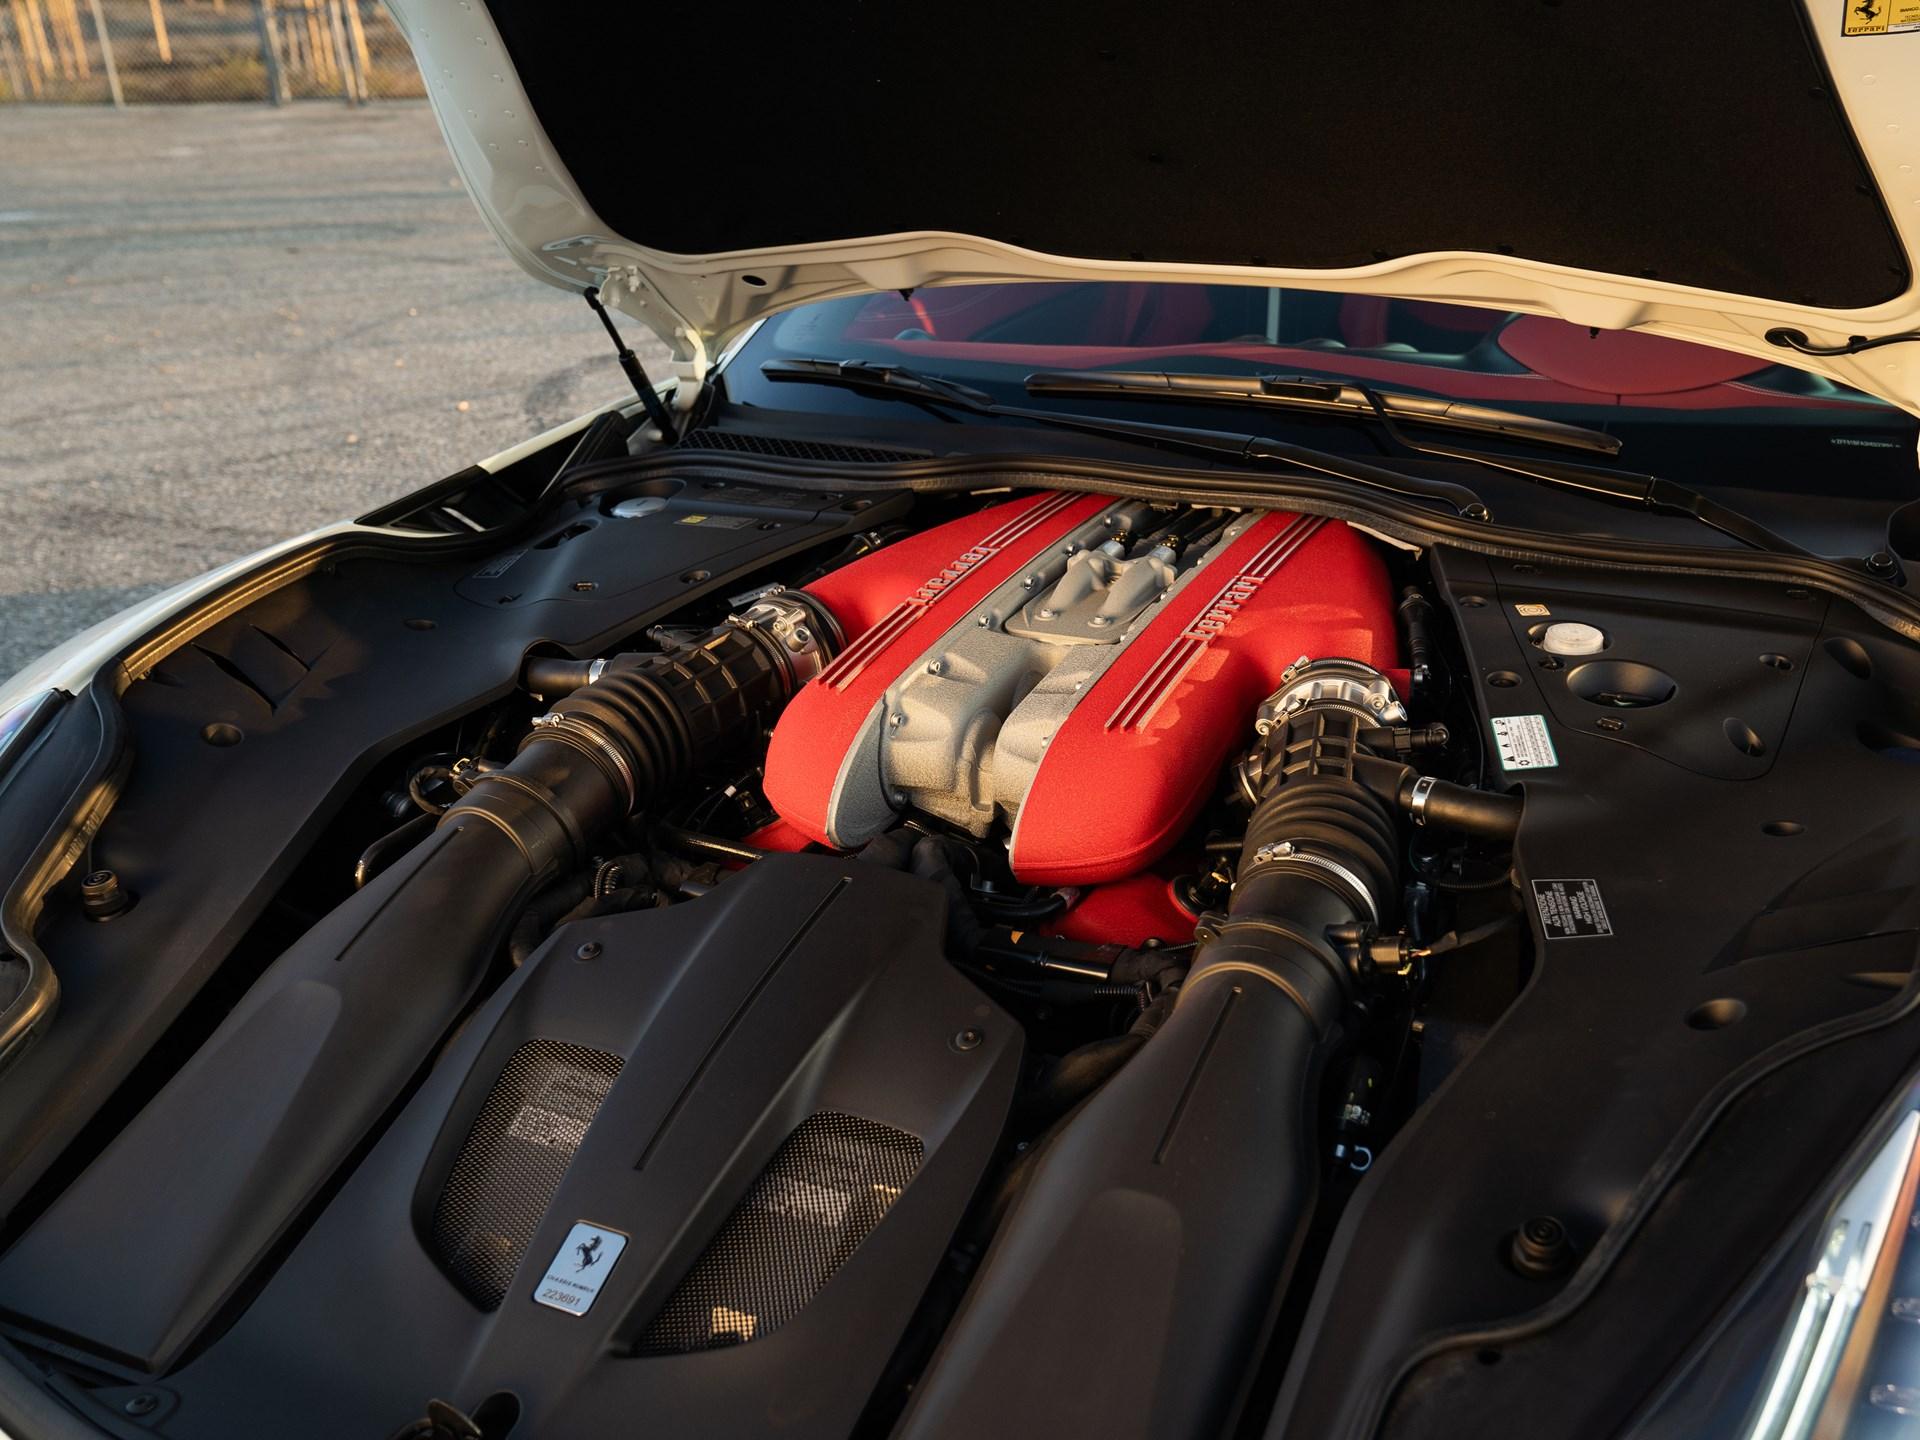 2017 Ferrari F12tdf engine